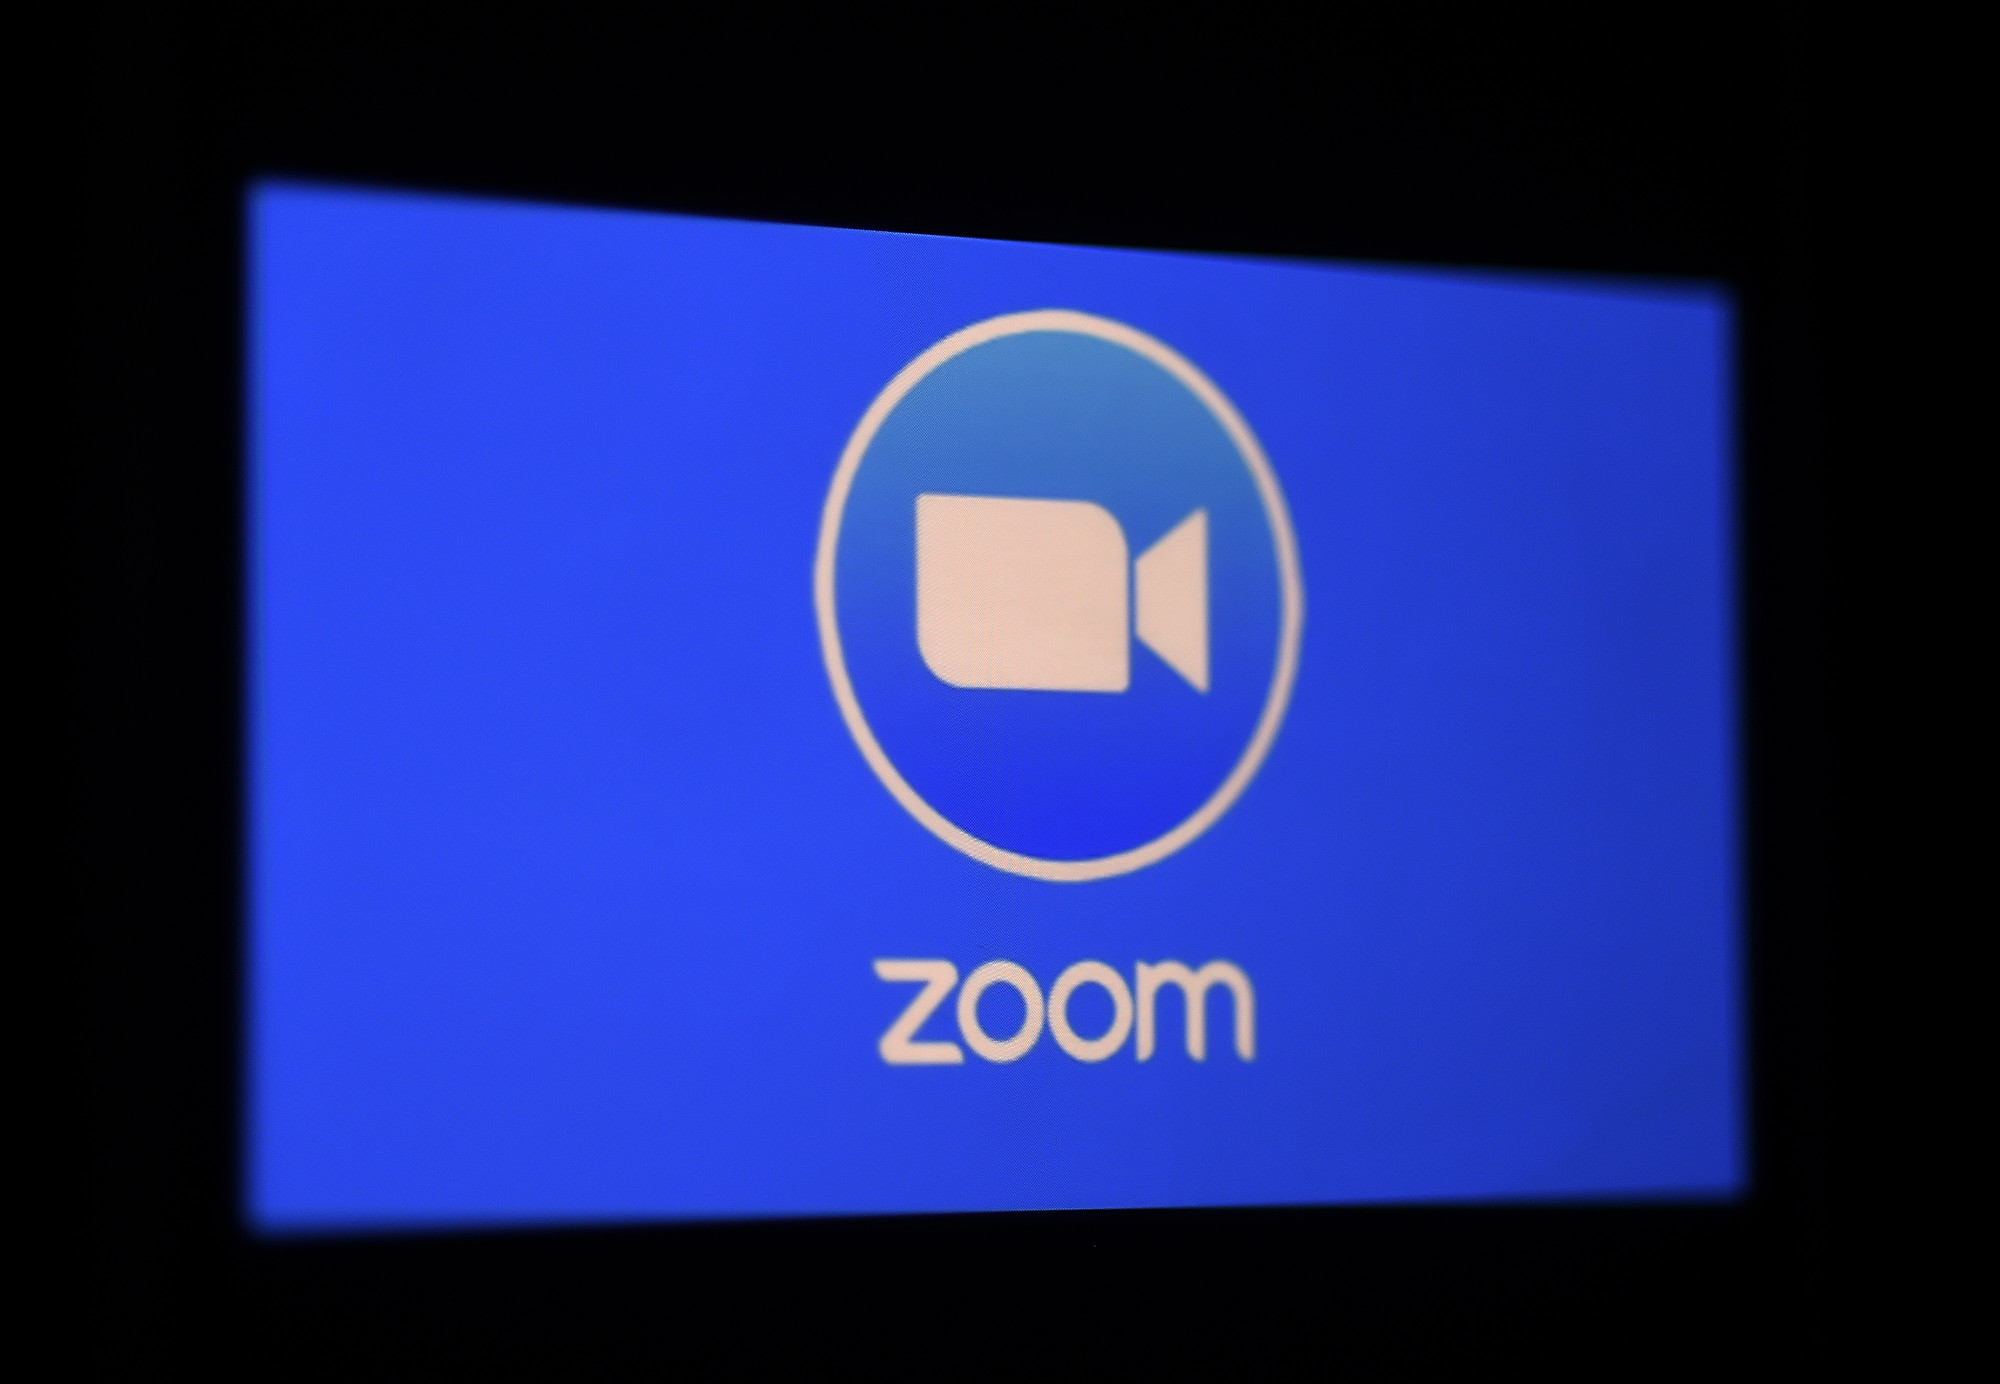 Zoom助中共言論審查 關閉維權人士美國帳號